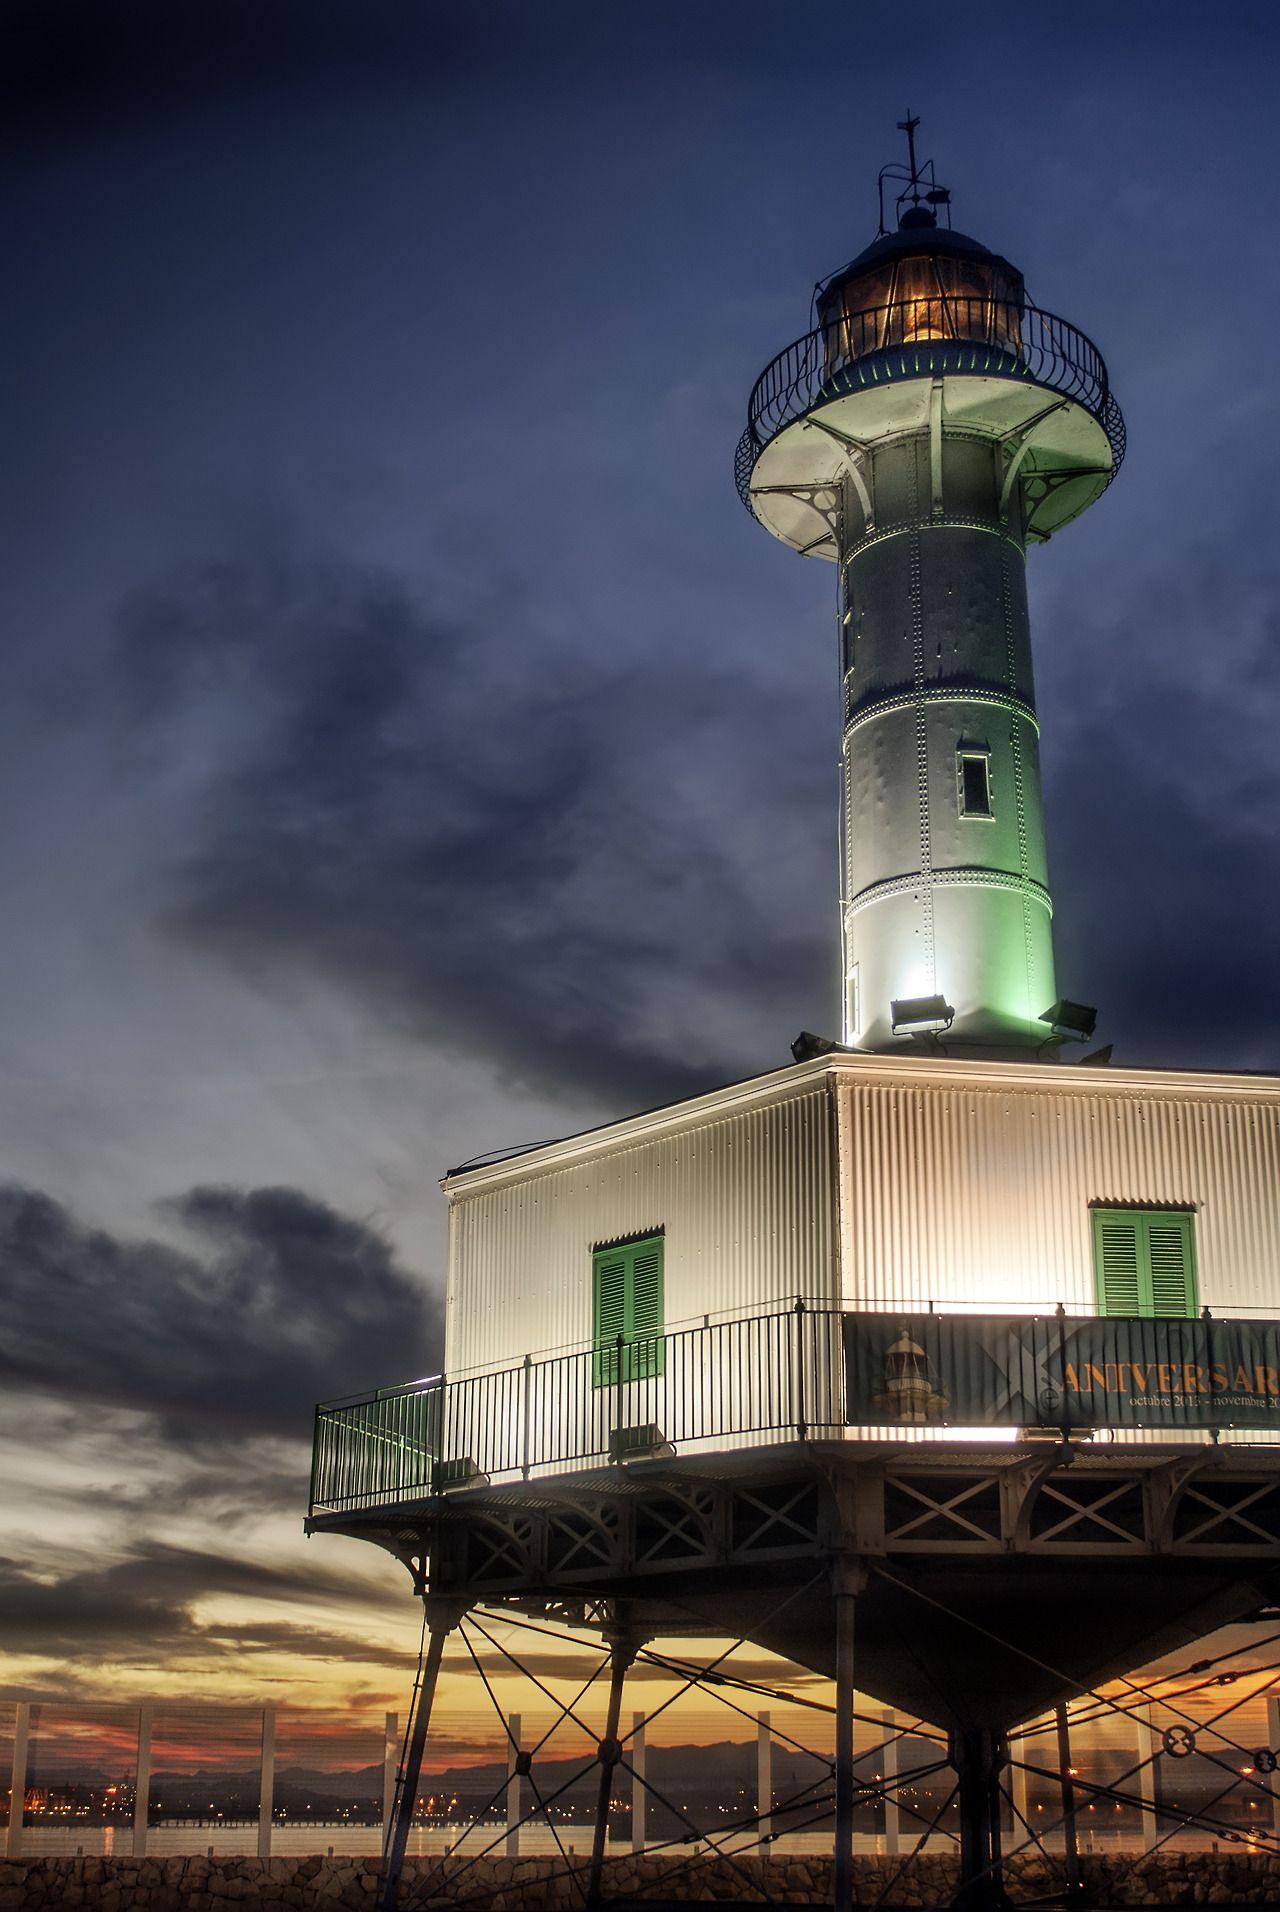 The Old Lighthouse Photo By Juan Manuel Saenz De Santa Mar A